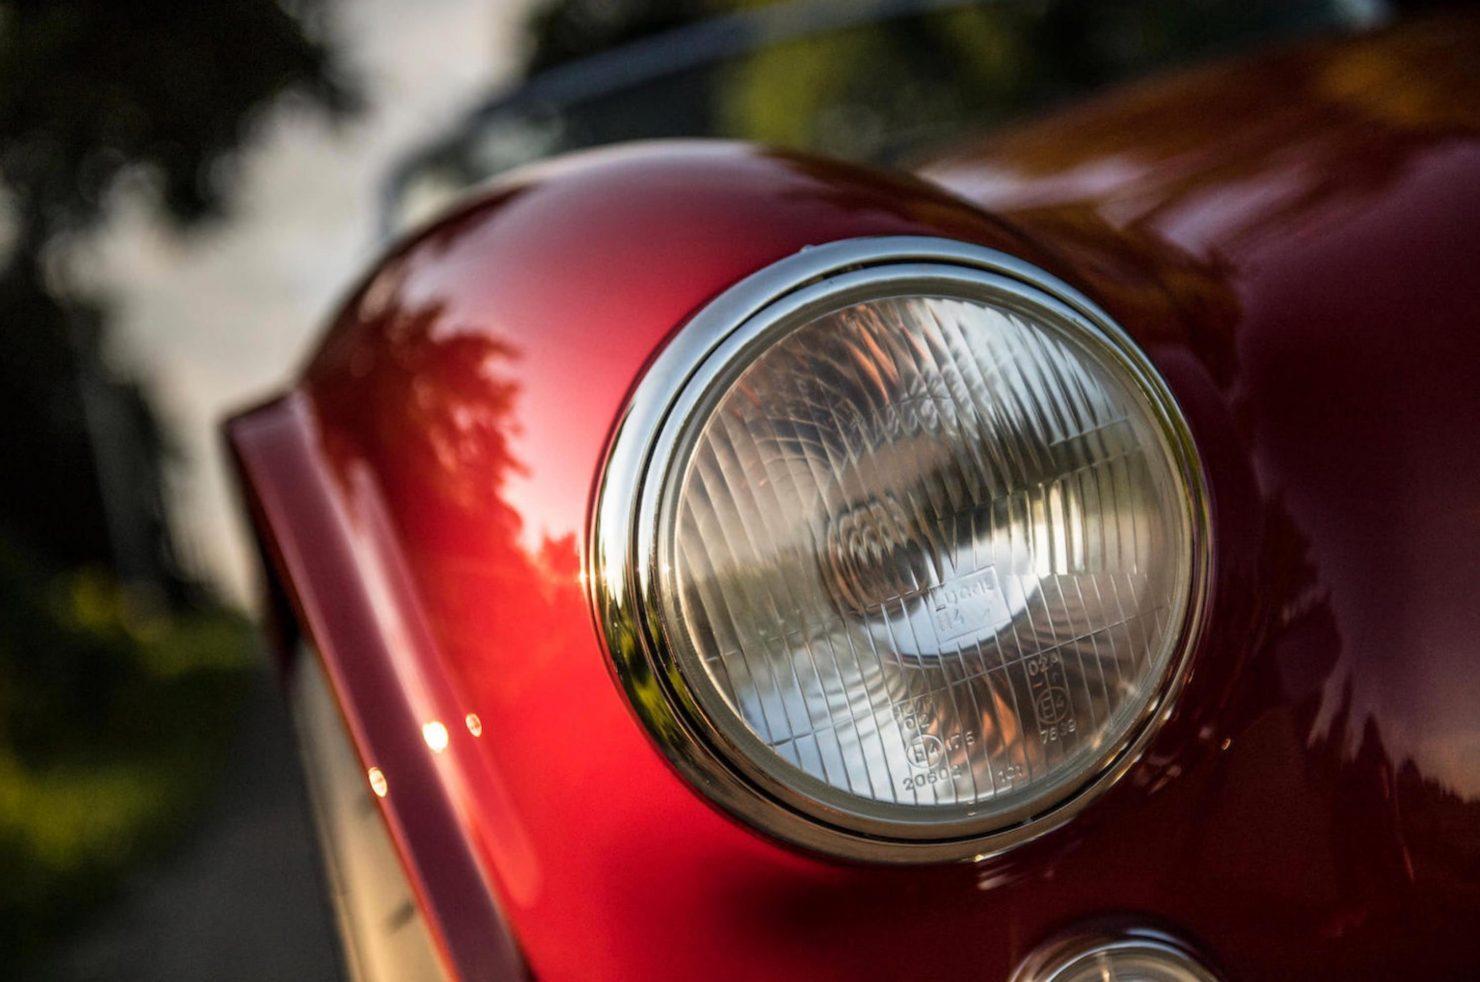 shelby ac cobra 289 27 1480x982 - 1964 Shelby AC Cobra 289